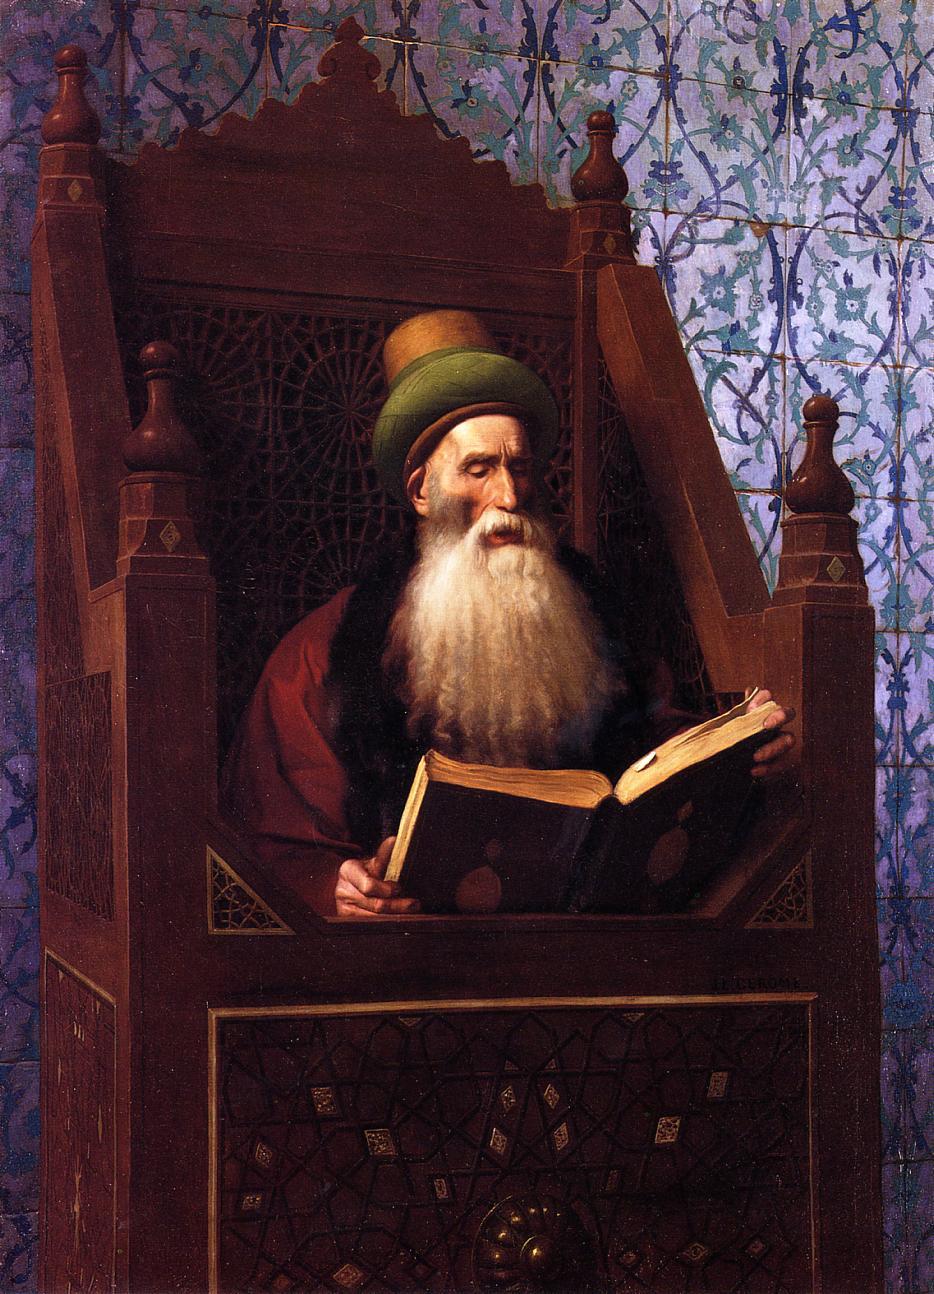 Mufti Reading in His Prayer Stool :: Jean-Leon Gerome - scenes of Oriental life (Orientalism) in art and painting ôîòî